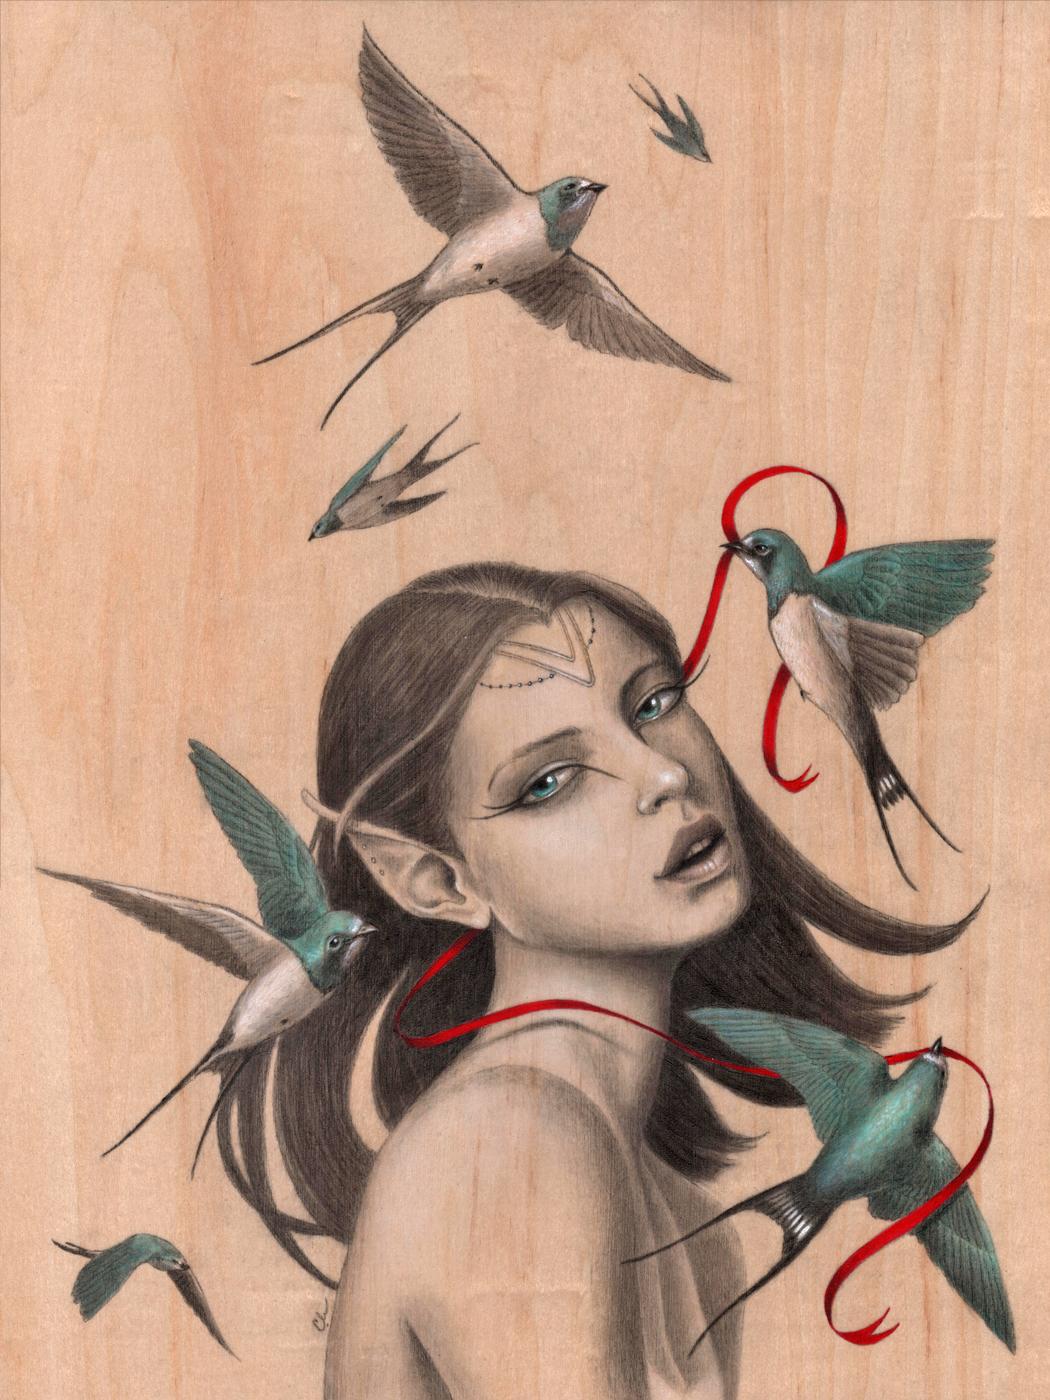 Caught - Original Acrylic Painting by Artist Carolina Lebar